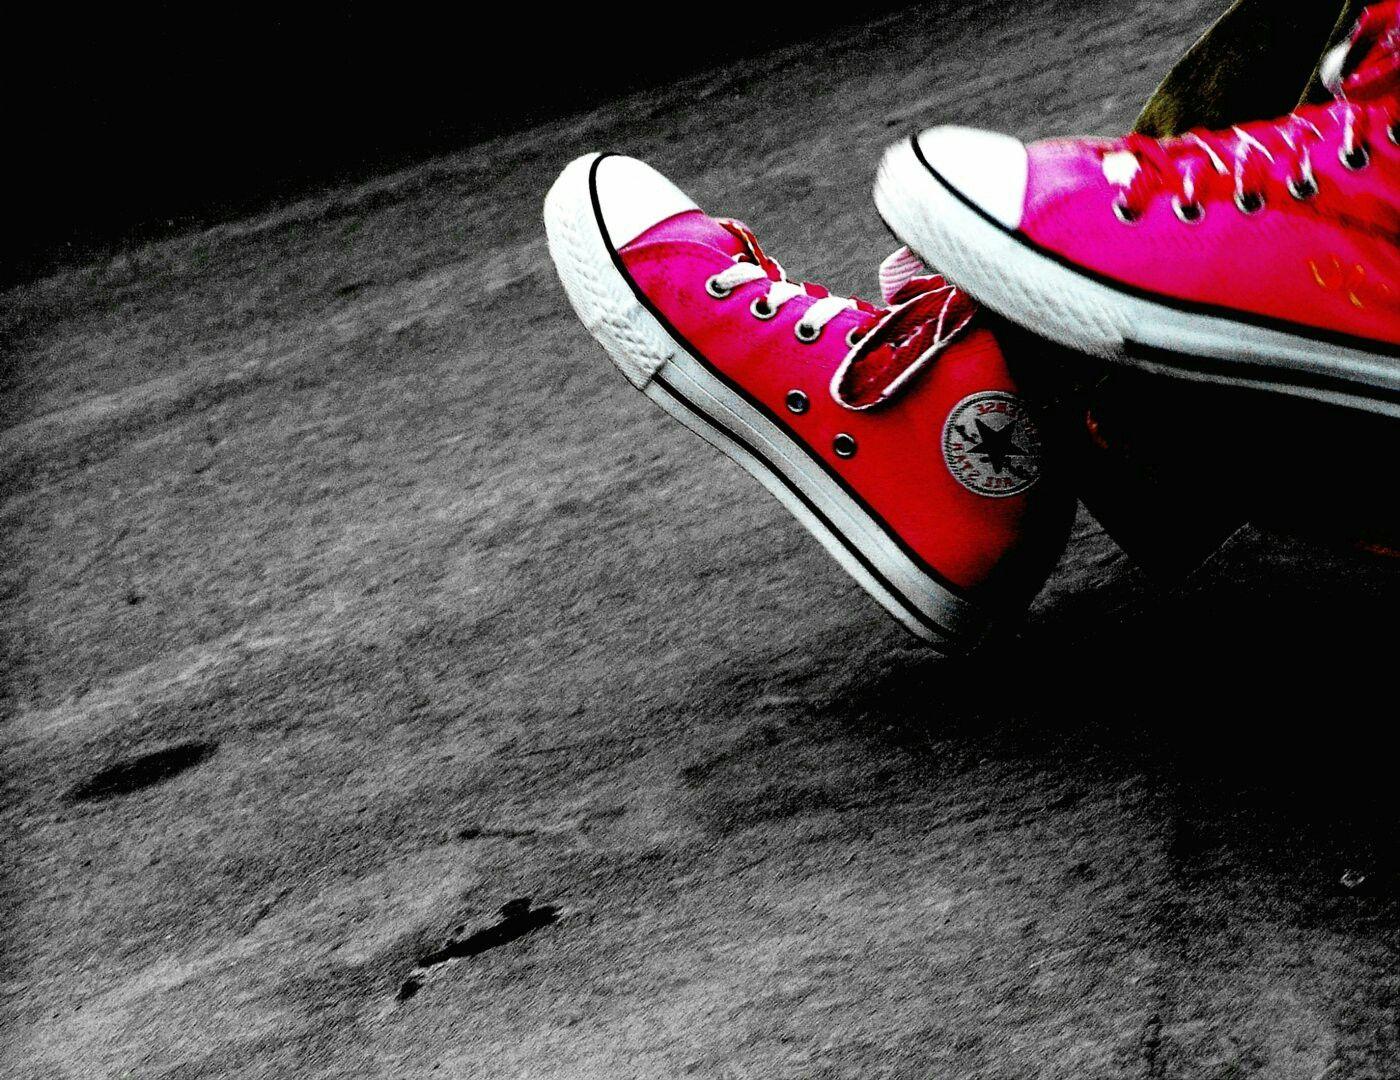 separation shoes 7809f 950fb Imagenes Libres, Cisnes, Emprendimiento, Pensamientos, Fondos, Escuela  Secundaria, Coches Azules